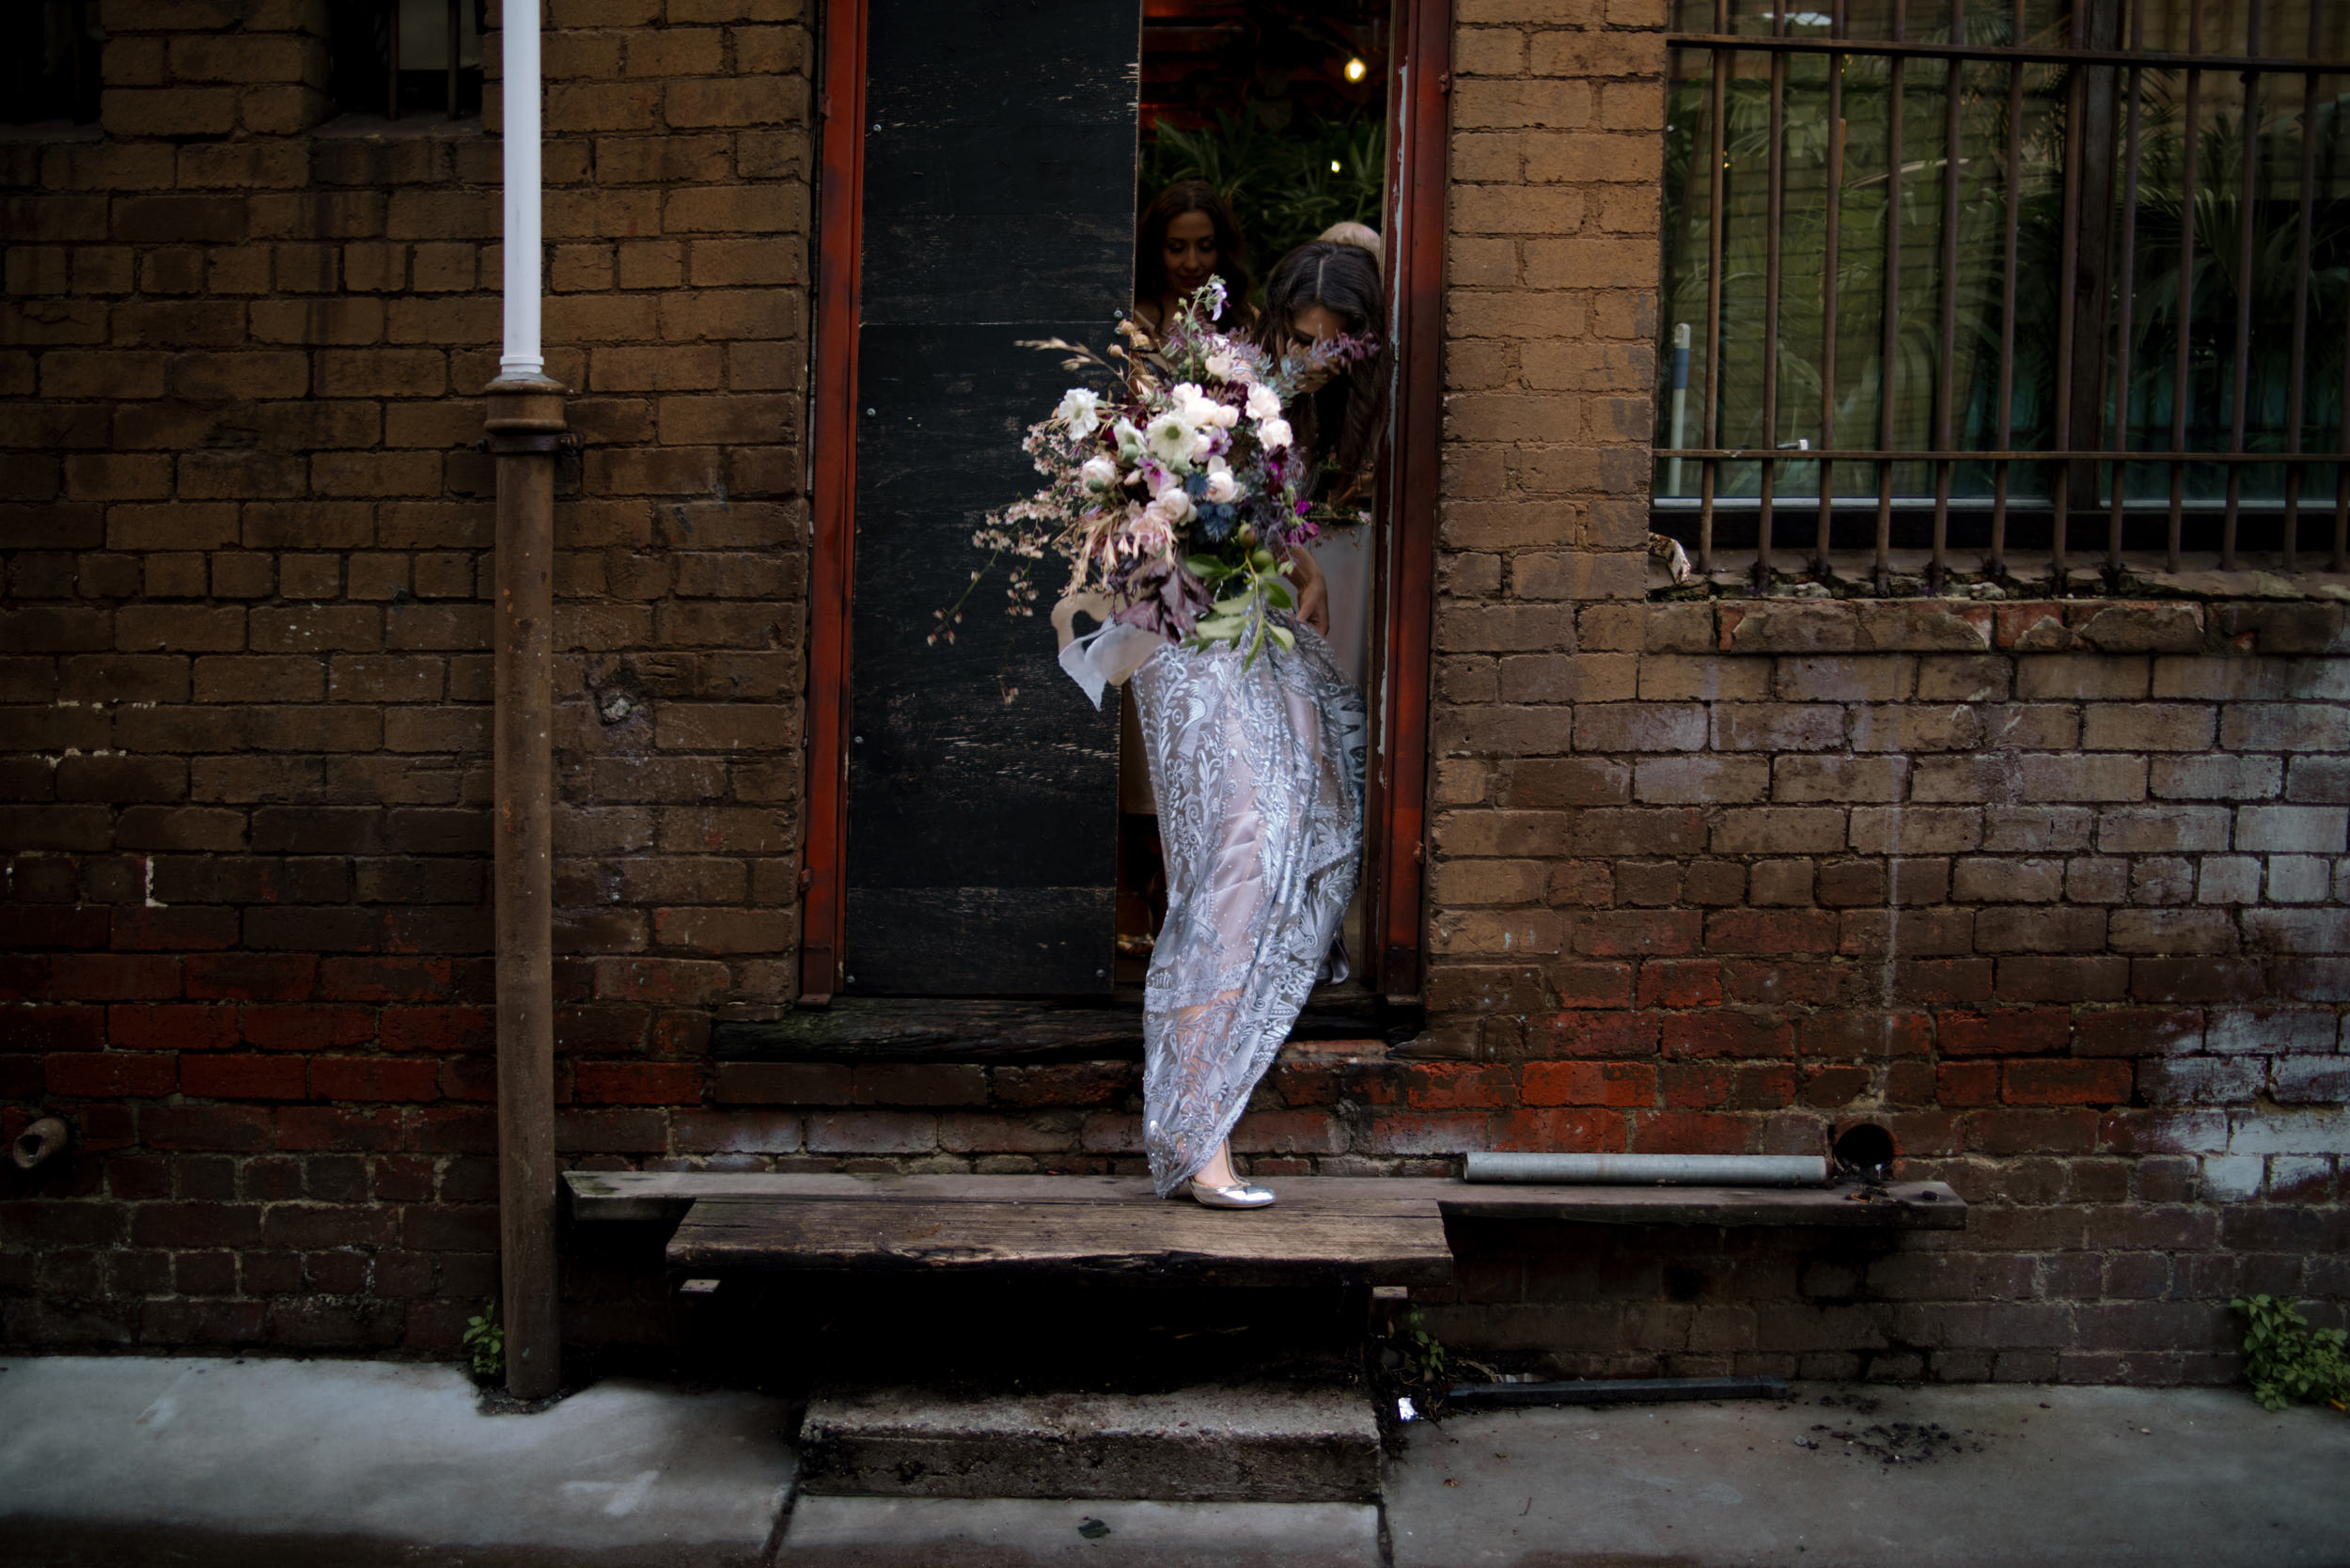 I-Got-You-Babe-&.Co.-Glasshaus-Wedding-Charlotte-Cameron0092.JPG